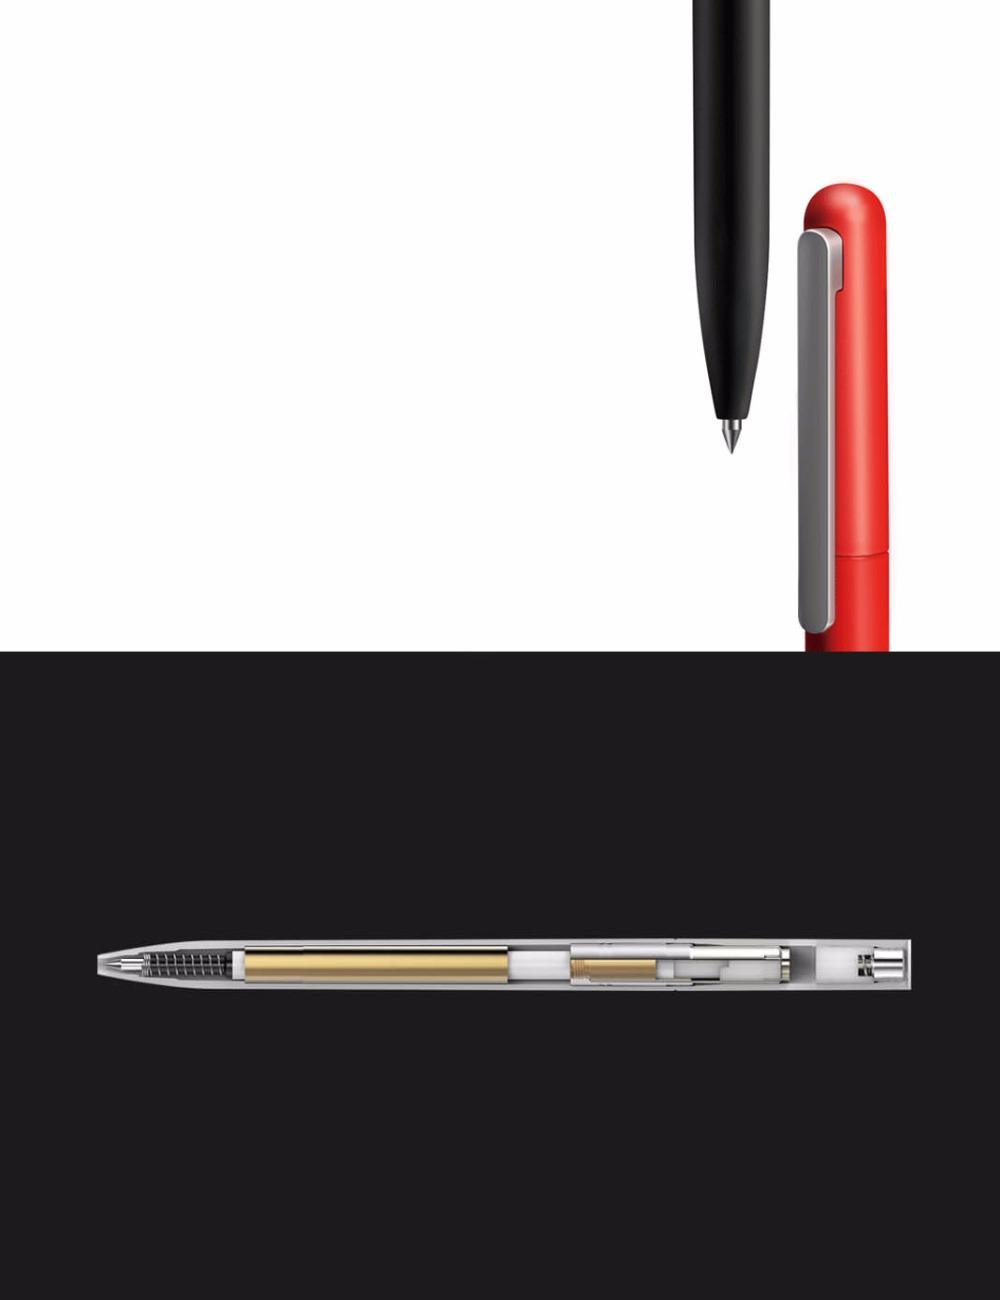 3Pcs Original Xiaomi Mijia Pinluo 0.5mm Gel Pen Signing Pen Smooth Refill For Office School Supplies